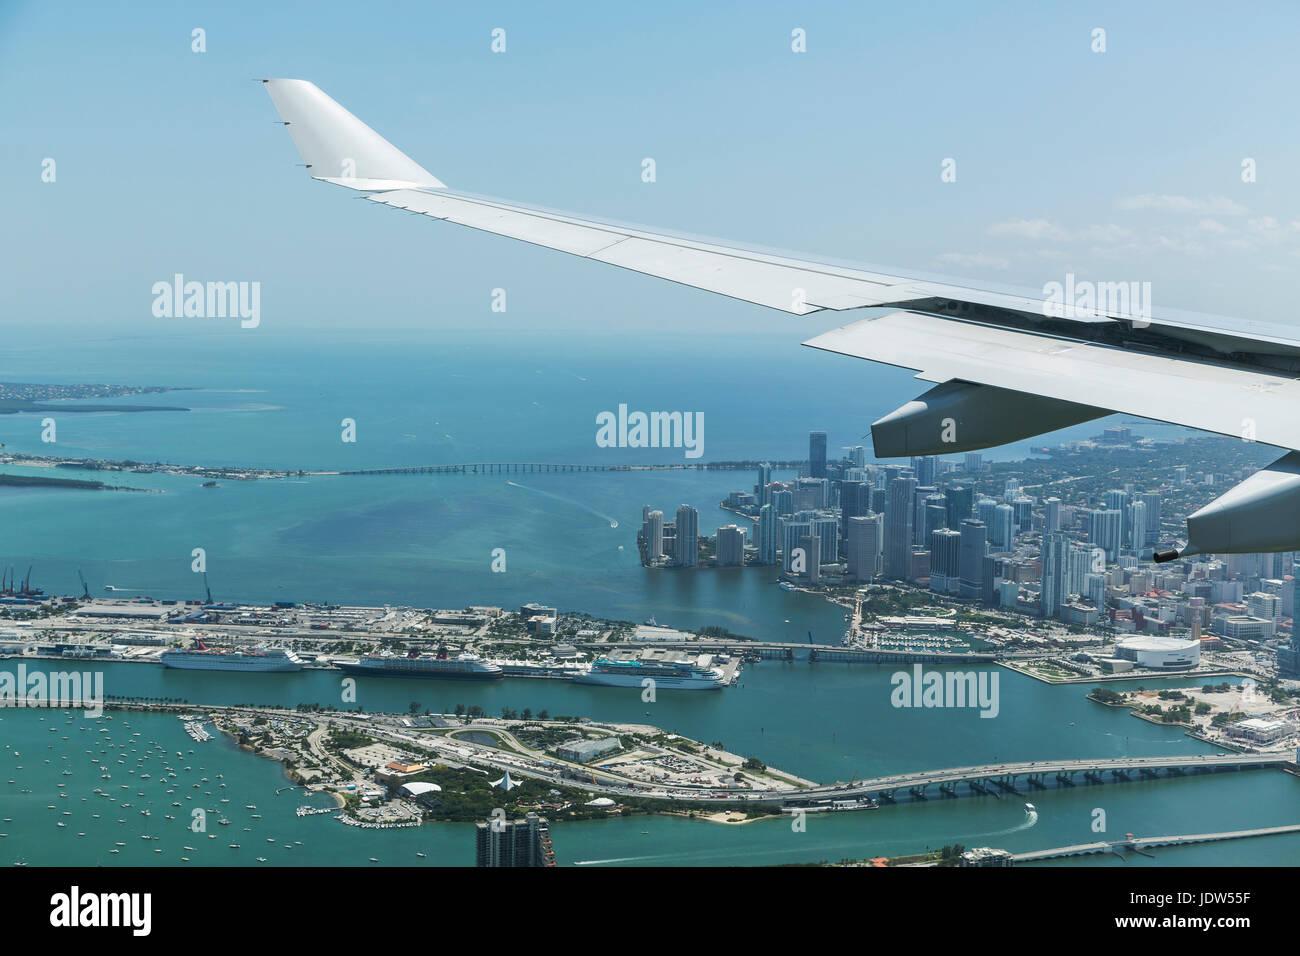 Airplane wing over Miami, Florida, USA - Stock Image